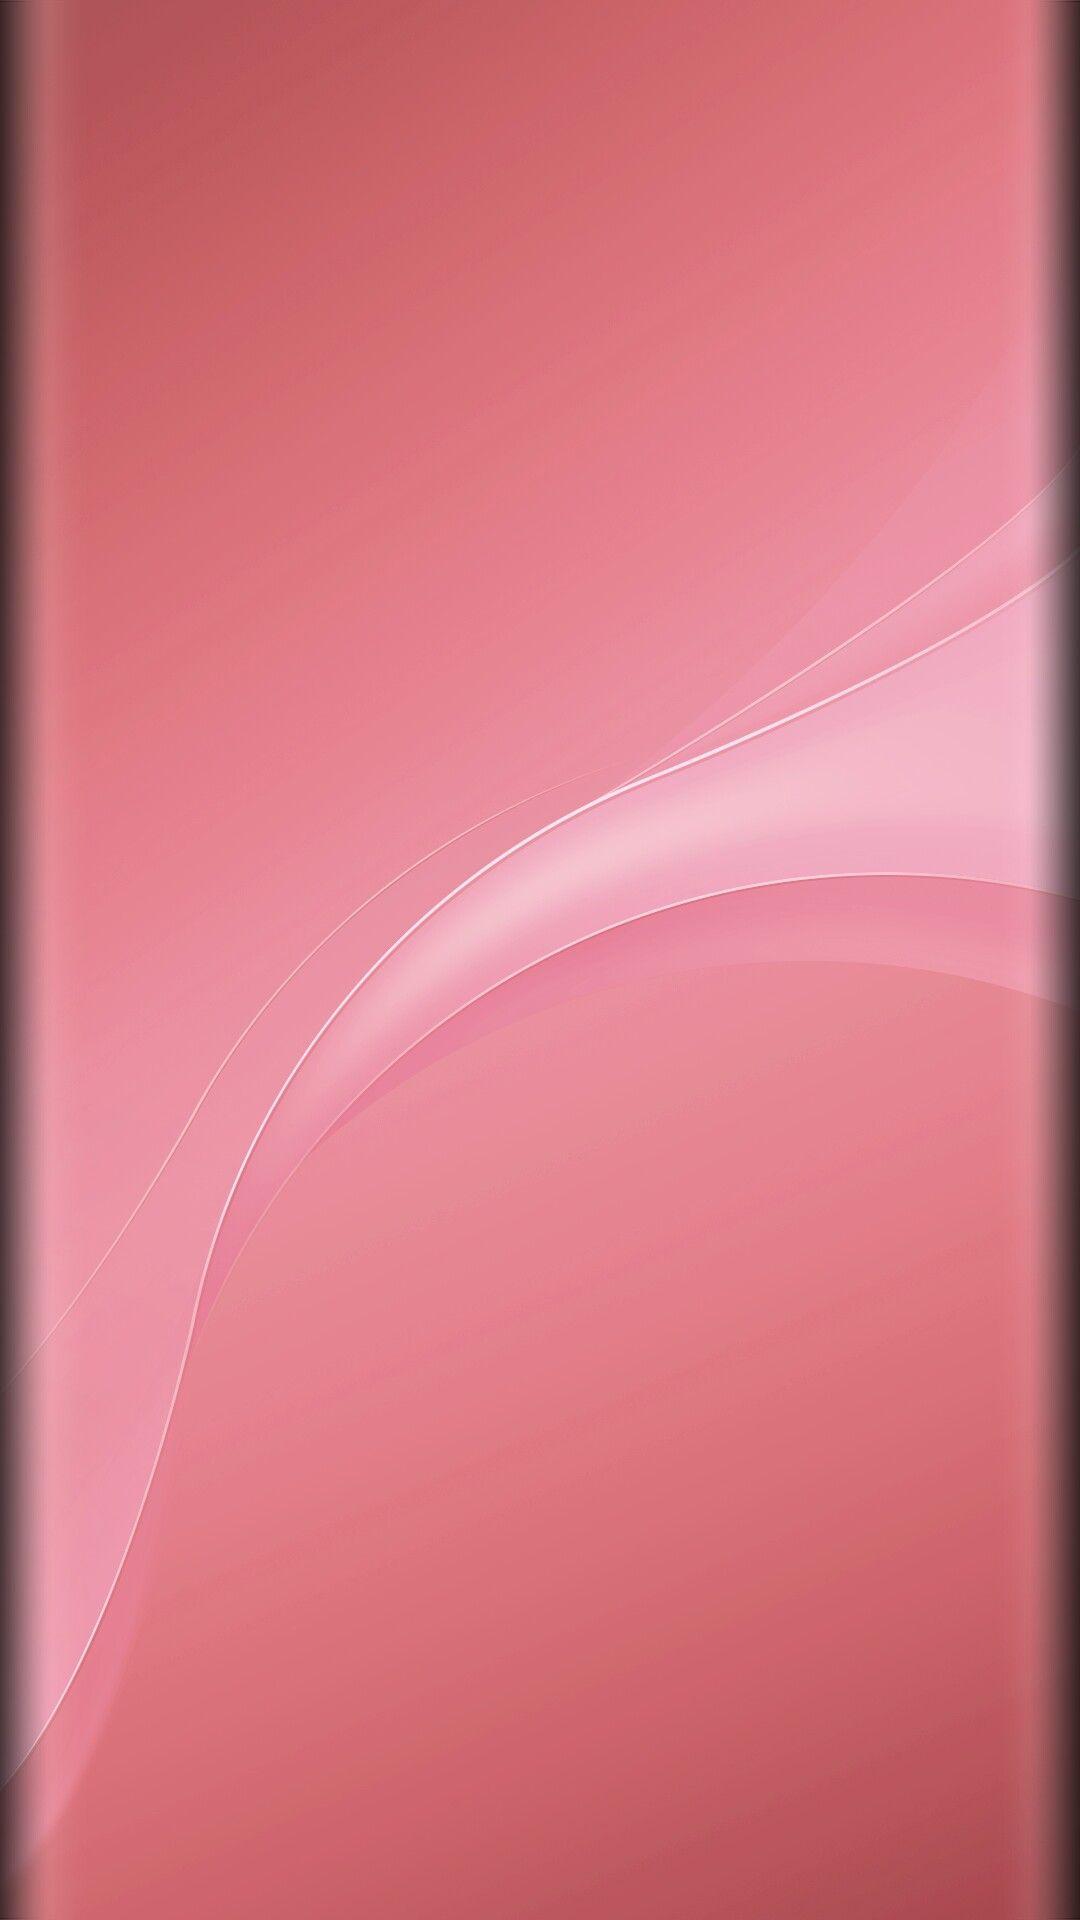 Galaxy S7 Edge Wallpaper iPhone Wallpaper & Background